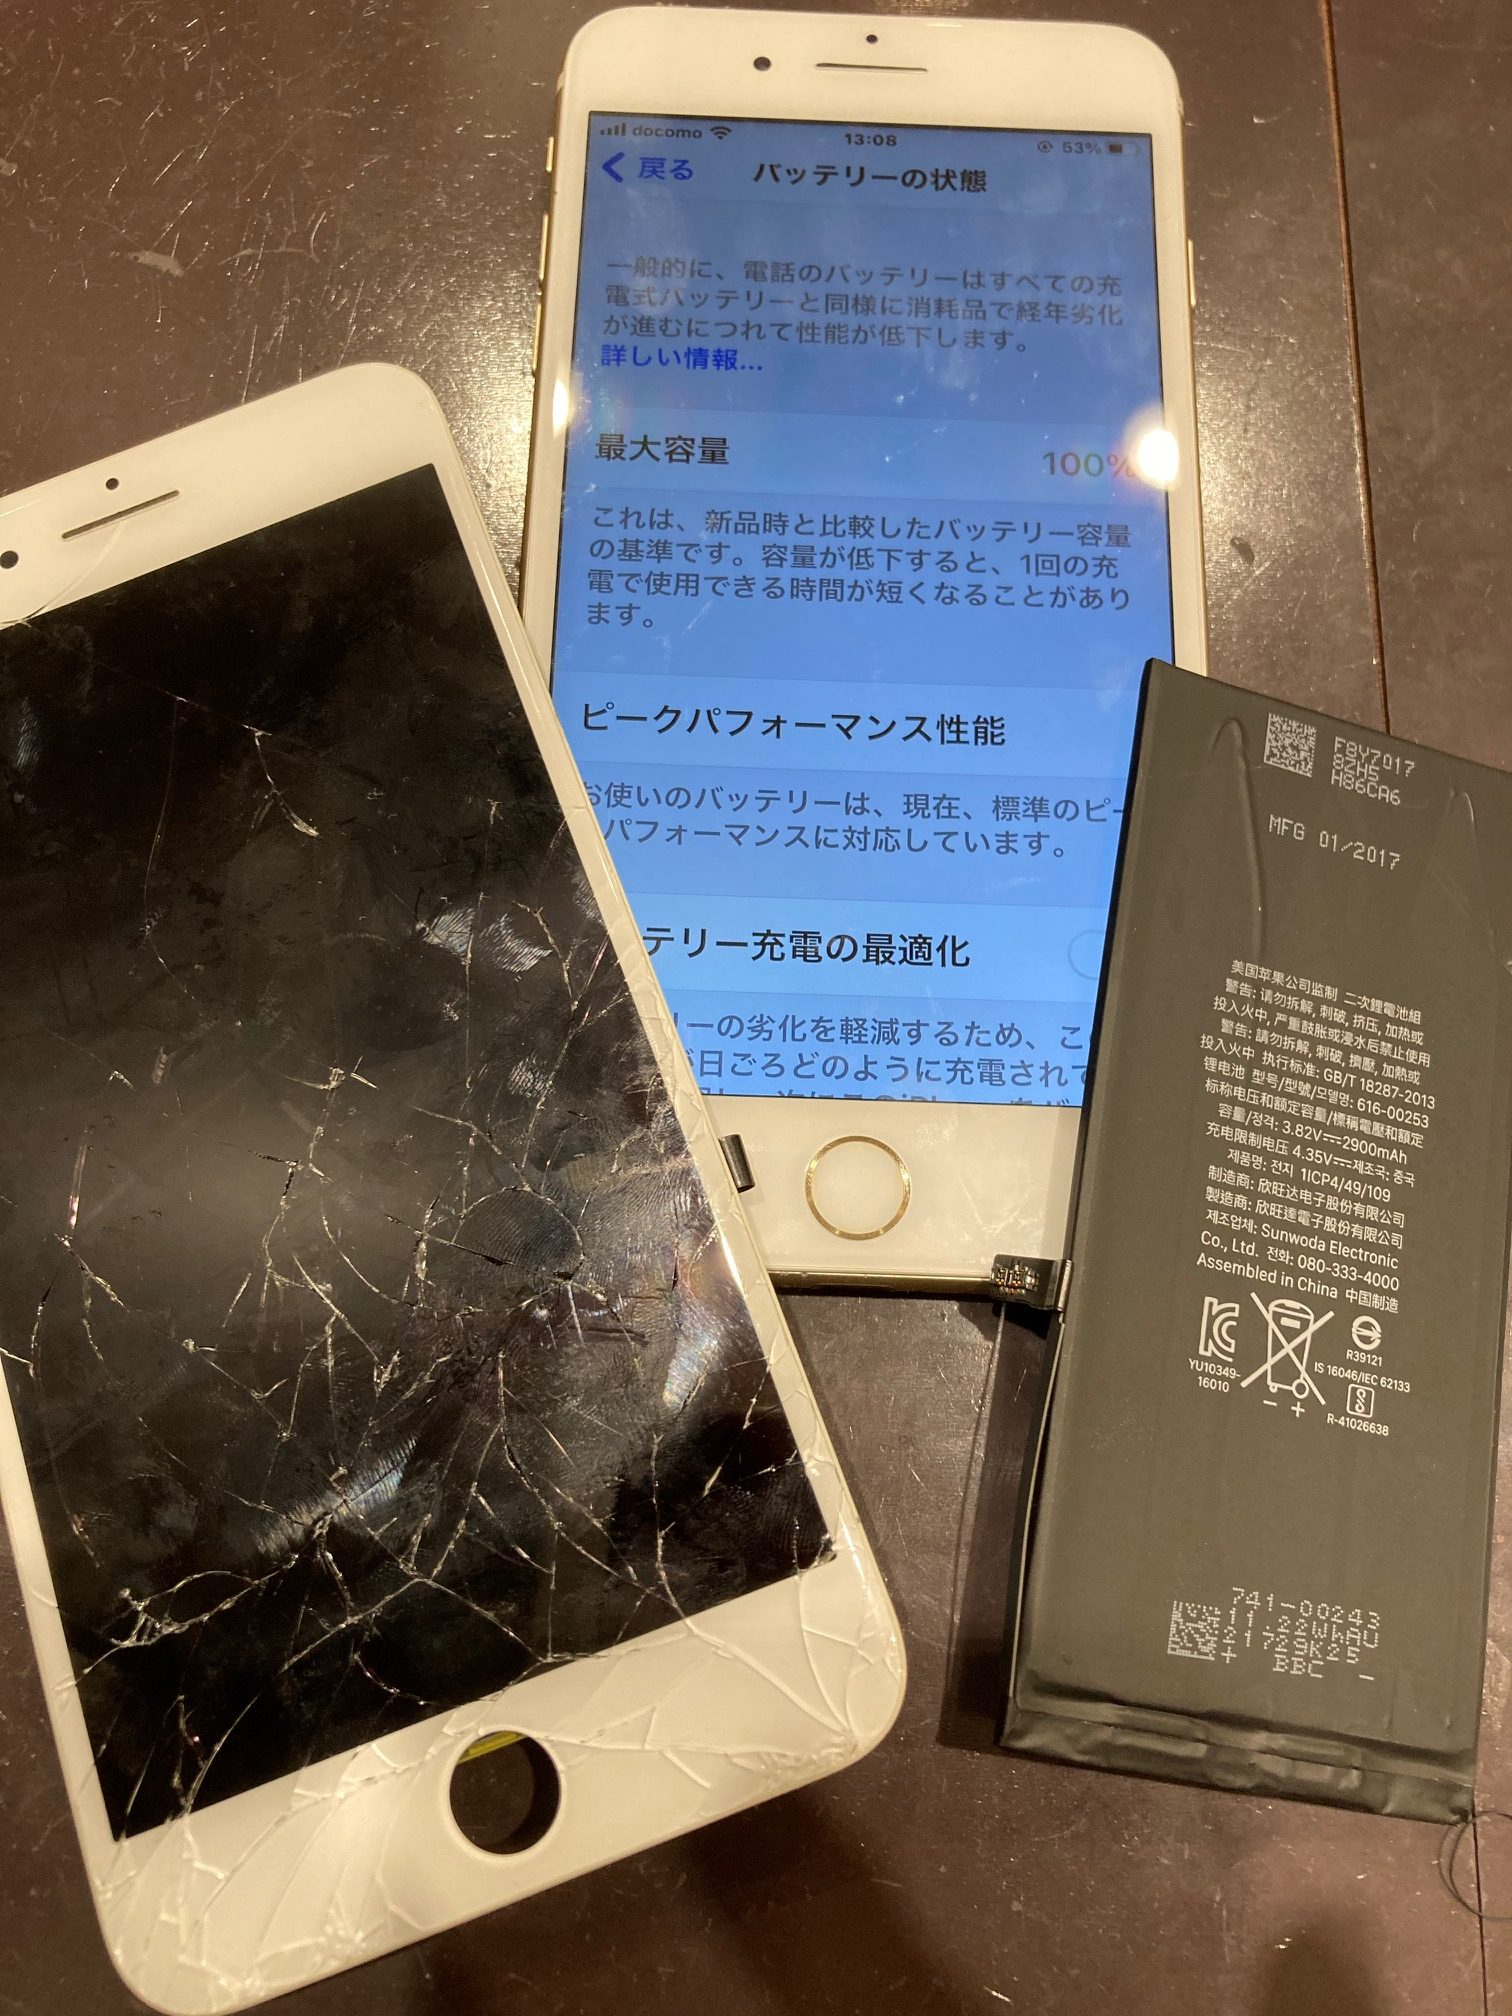 iPhone7Plusの画面交換&バッテリー交換をさせて頂きました♪スマートクールなら複数同時修理も即日で可能です!